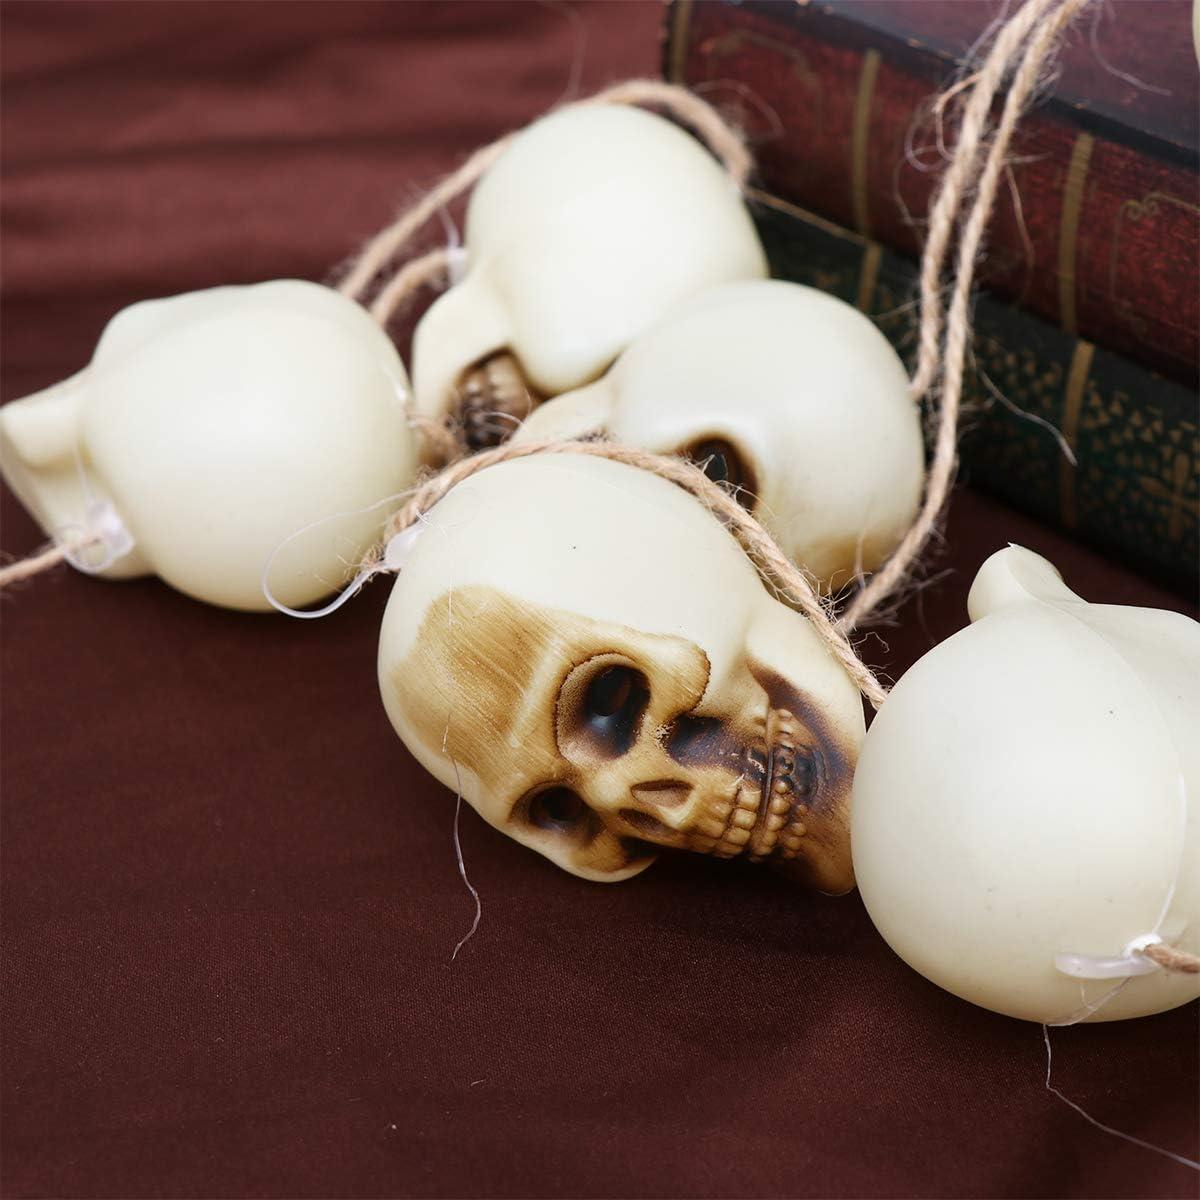 Amosfun Halloween H/ängender Sch/ädel Halloween H/ängender Skelettschmuck Haunted House Prop